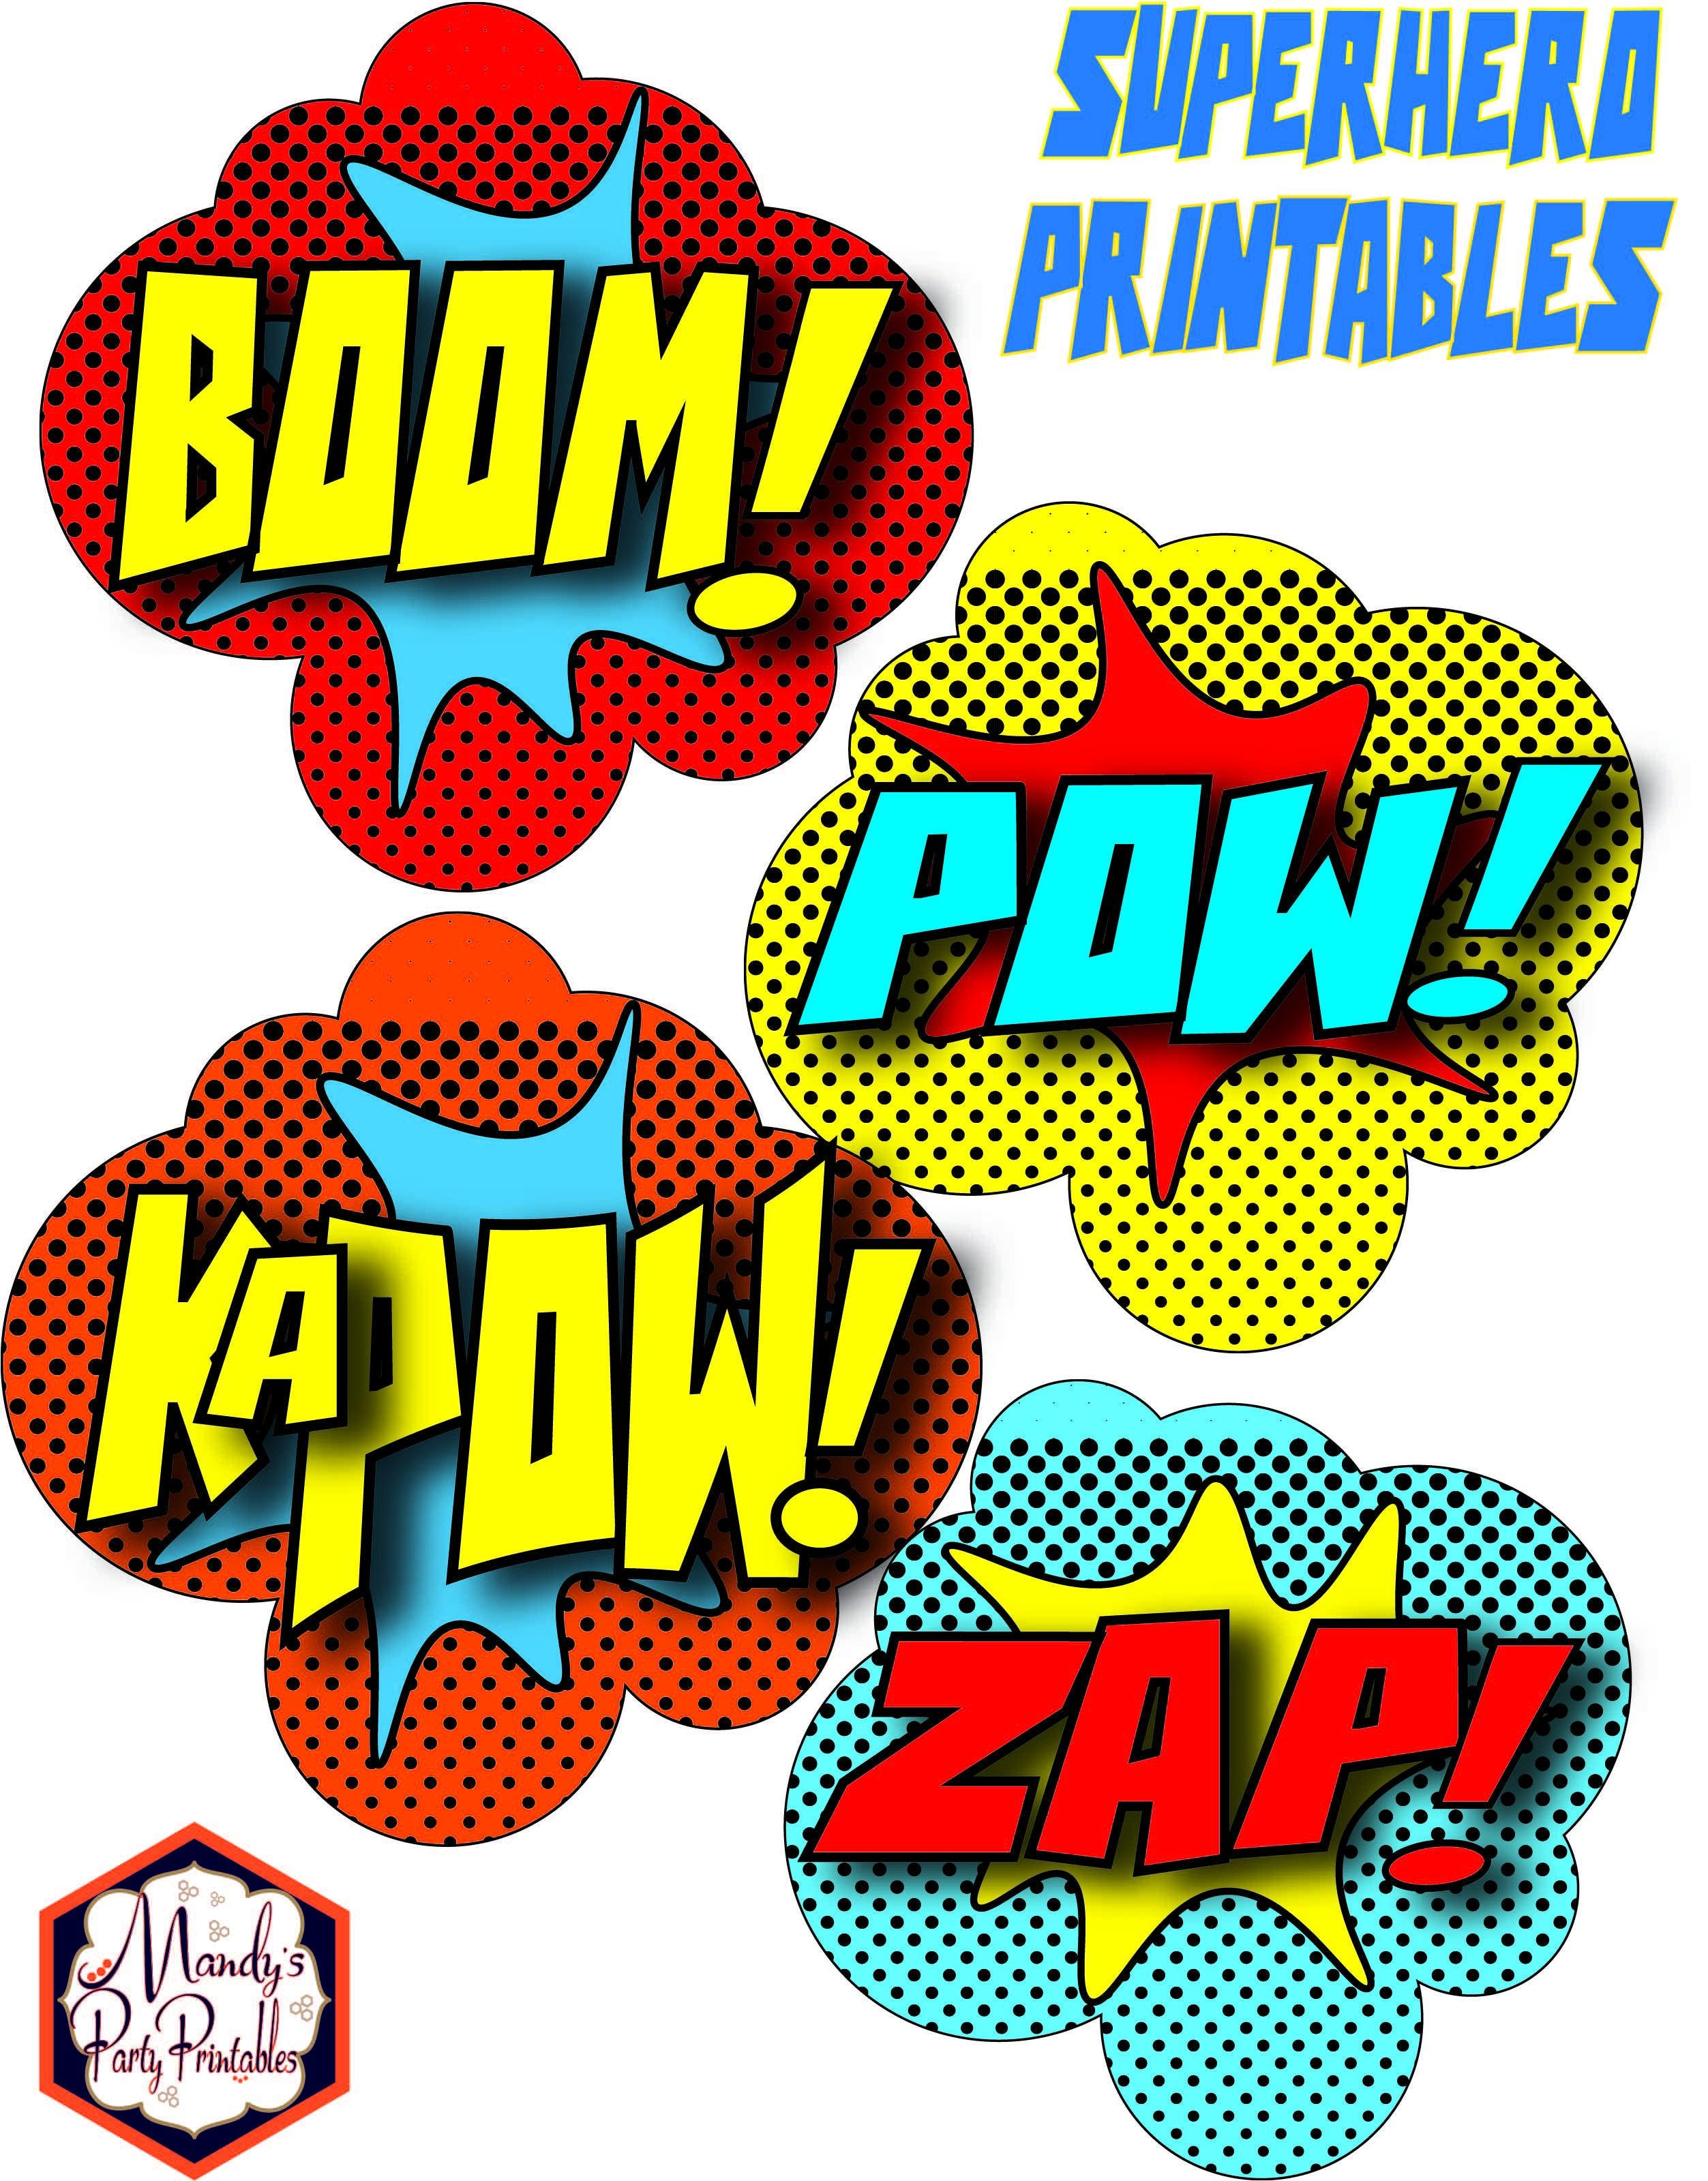 Free Pj Masks Party Printables Round 2 | Free Pj Masks Printables - Pj Mask Free Printables